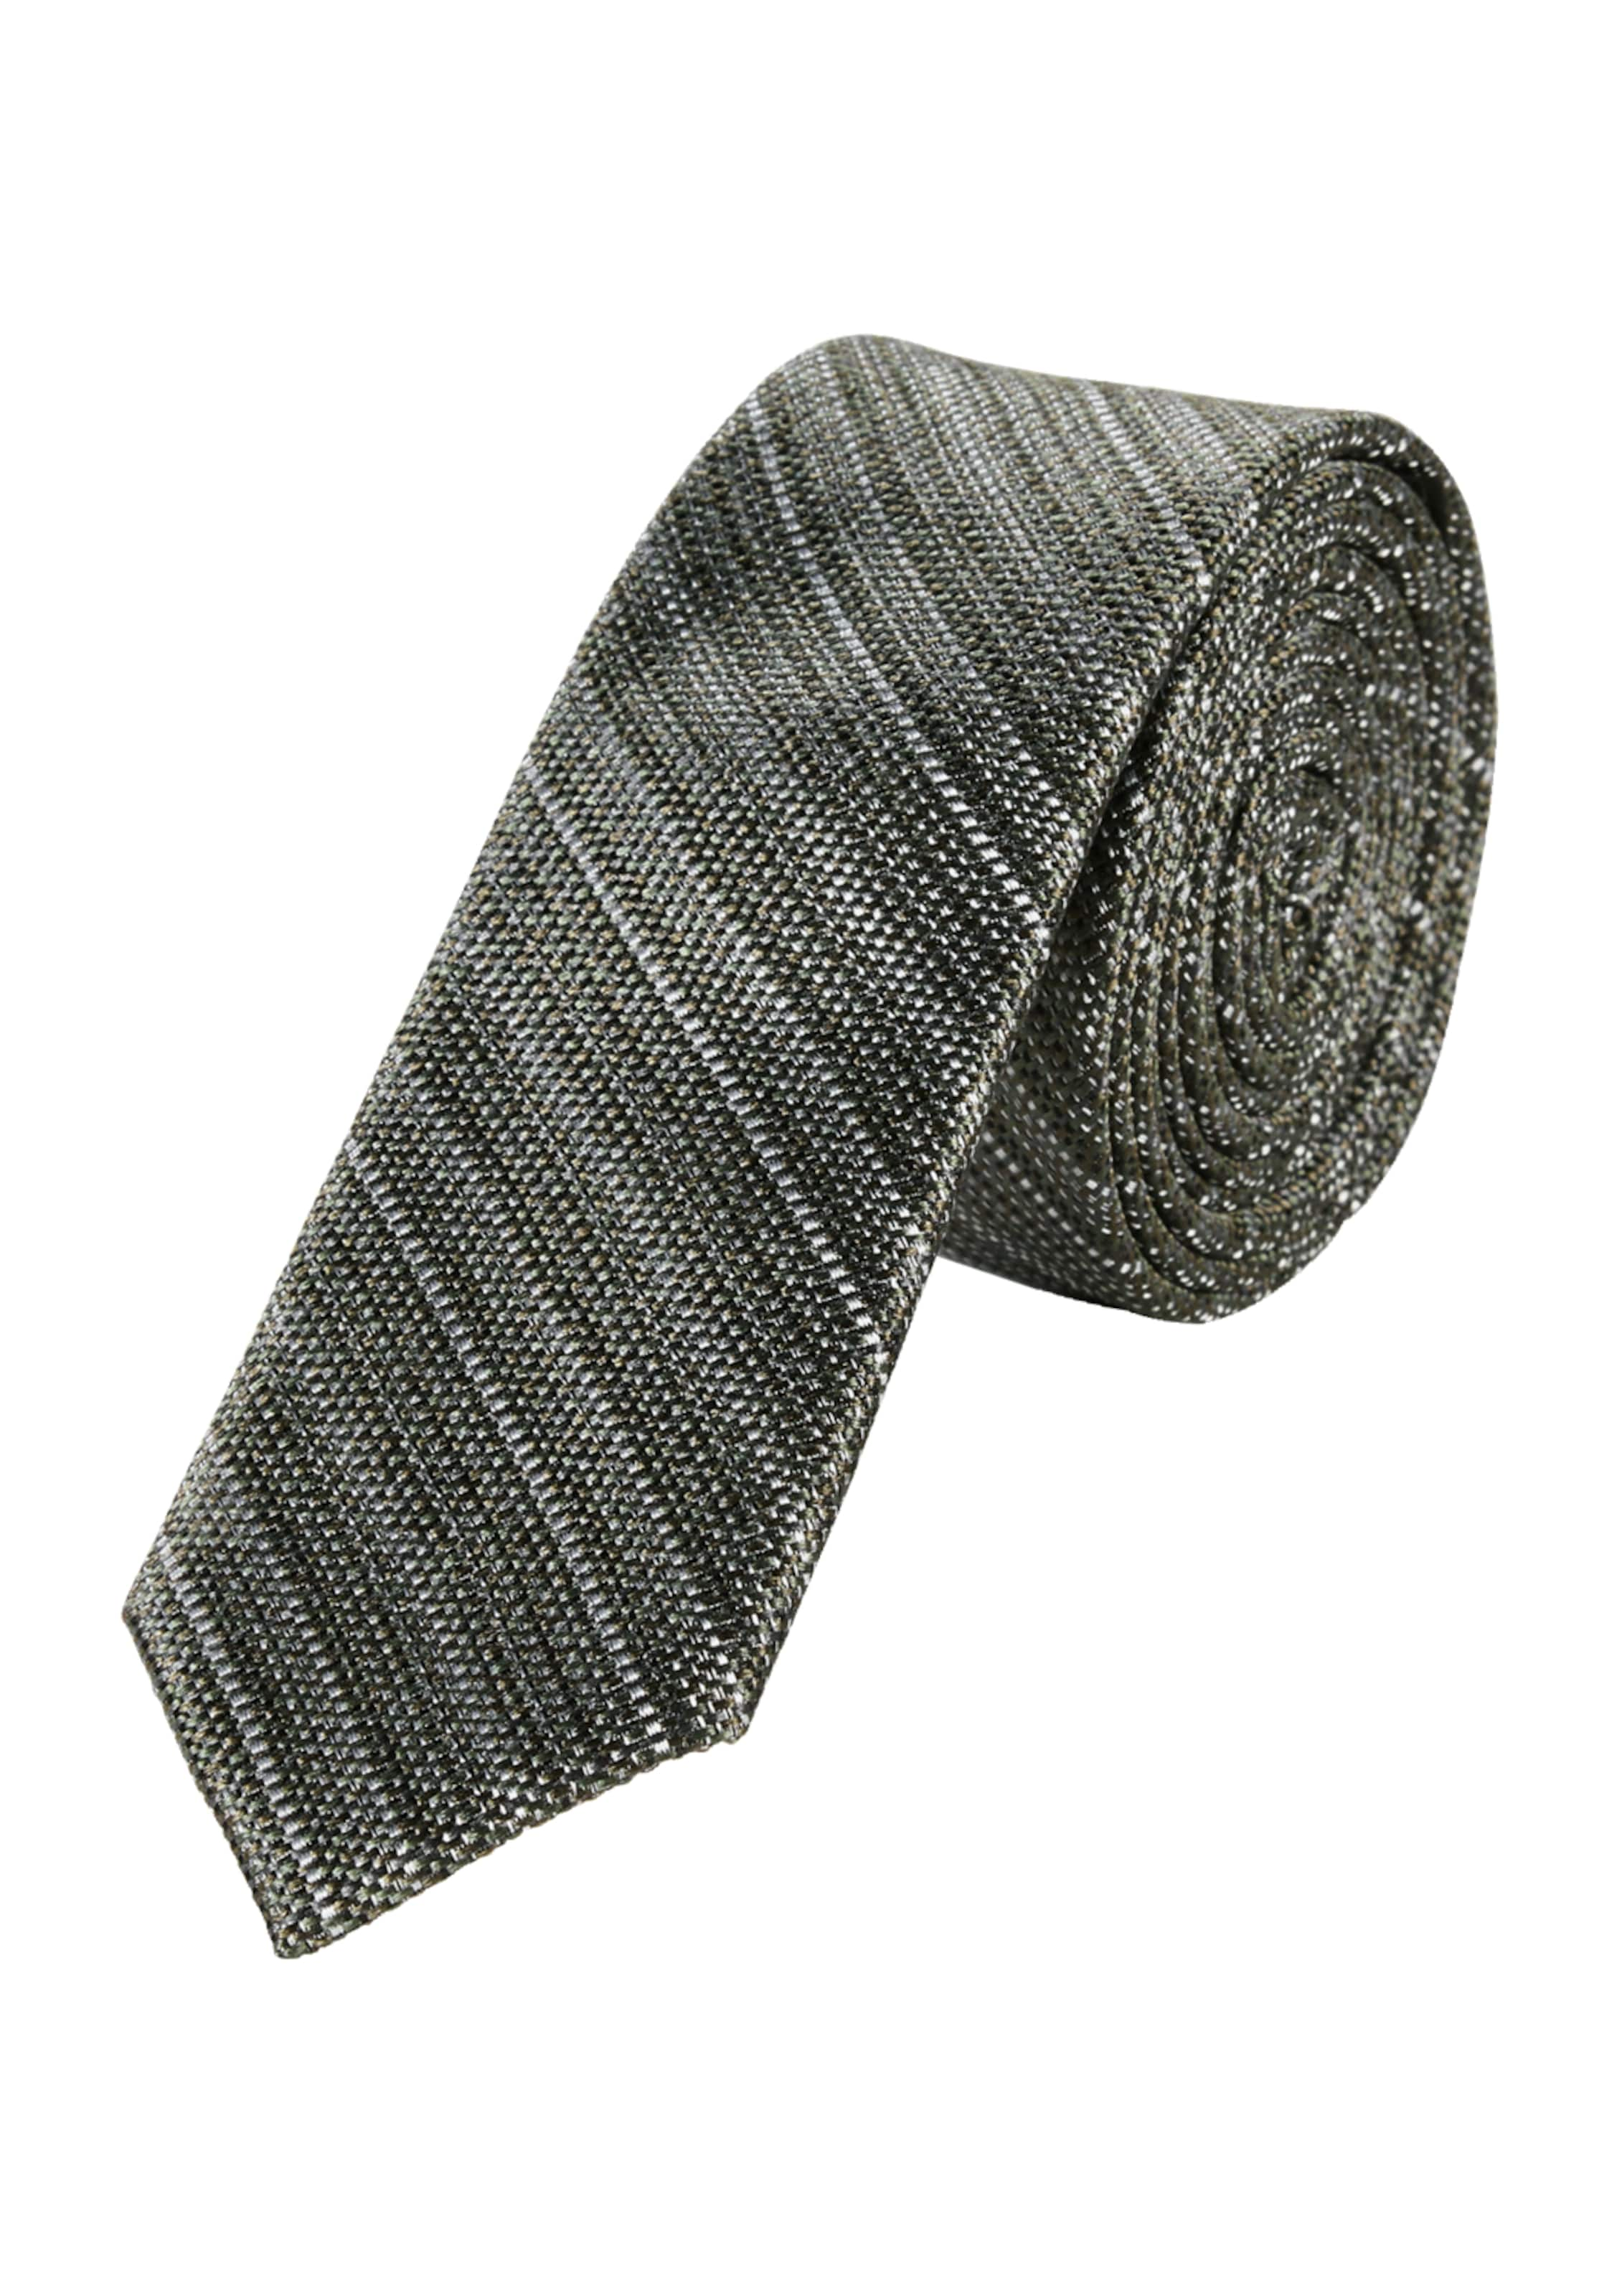 Label GrünKhaki Black Krawatte oliver In S ikZuPX